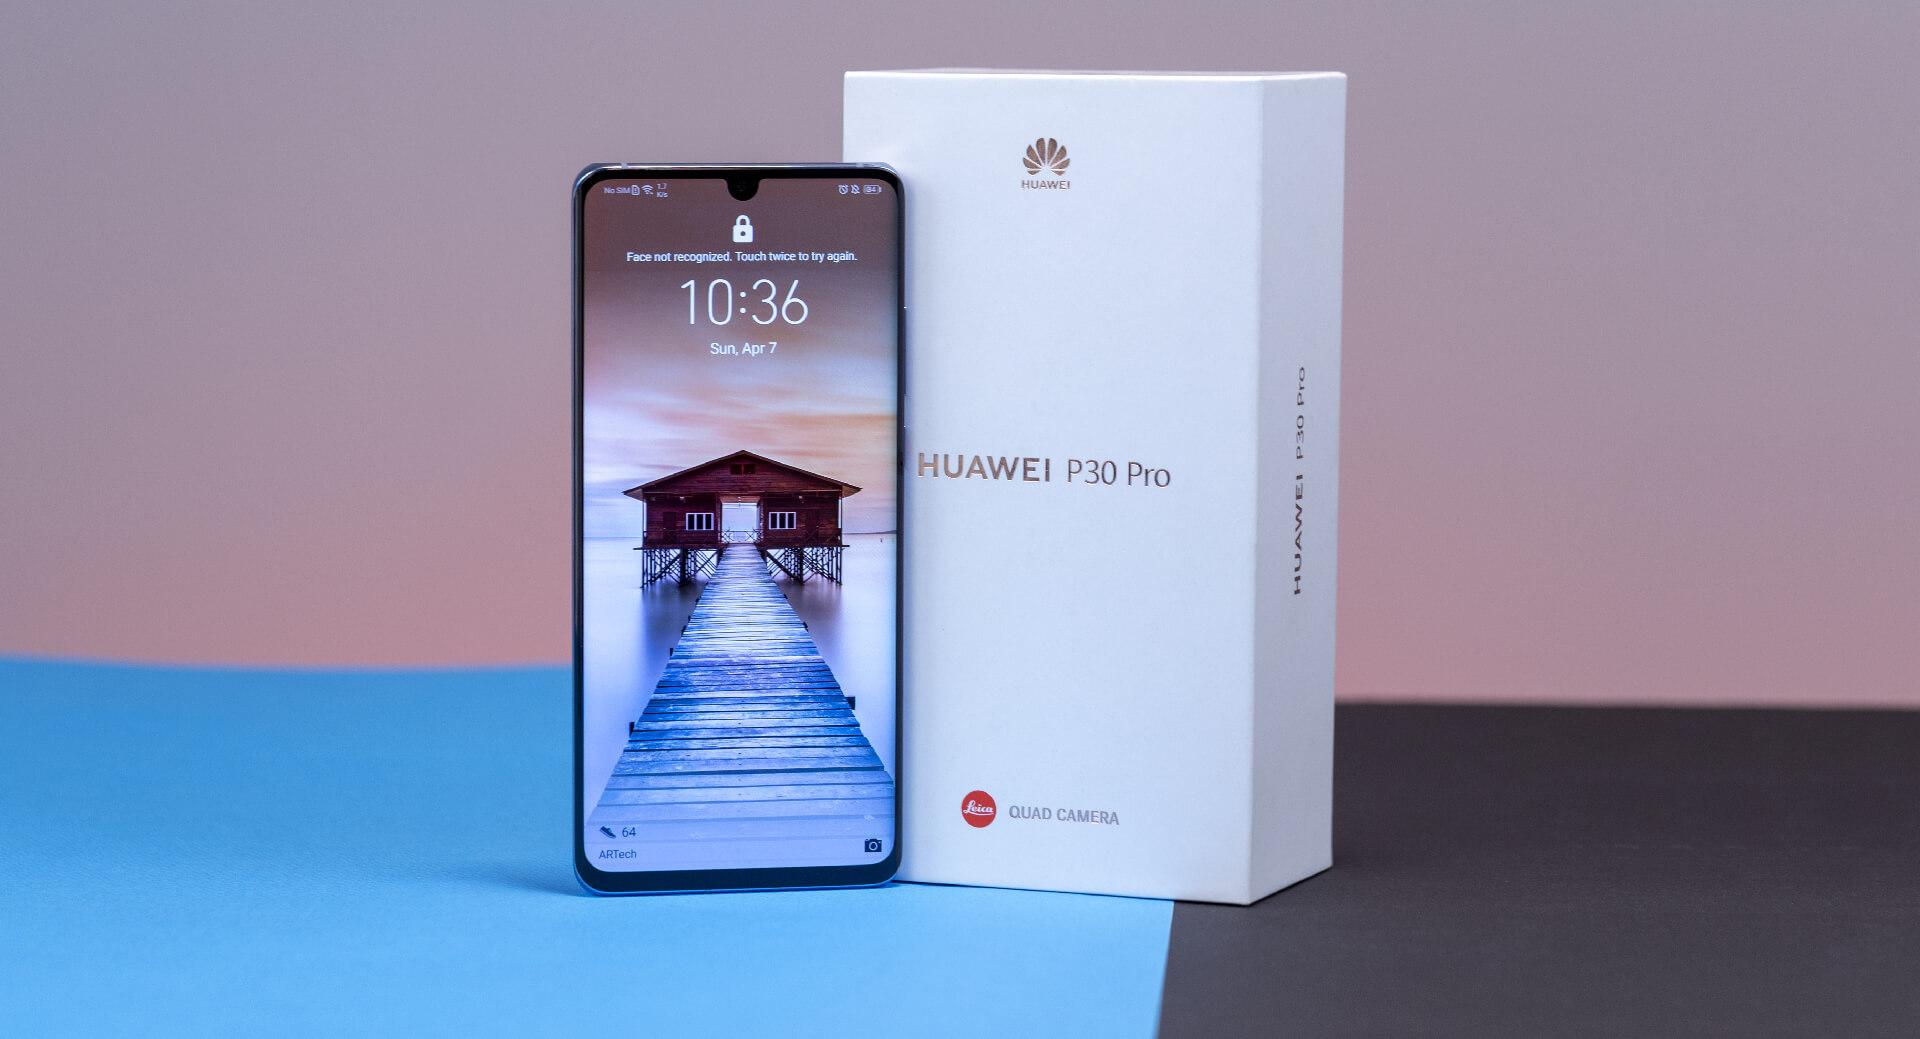 Huawei P30 Pro photos (2)